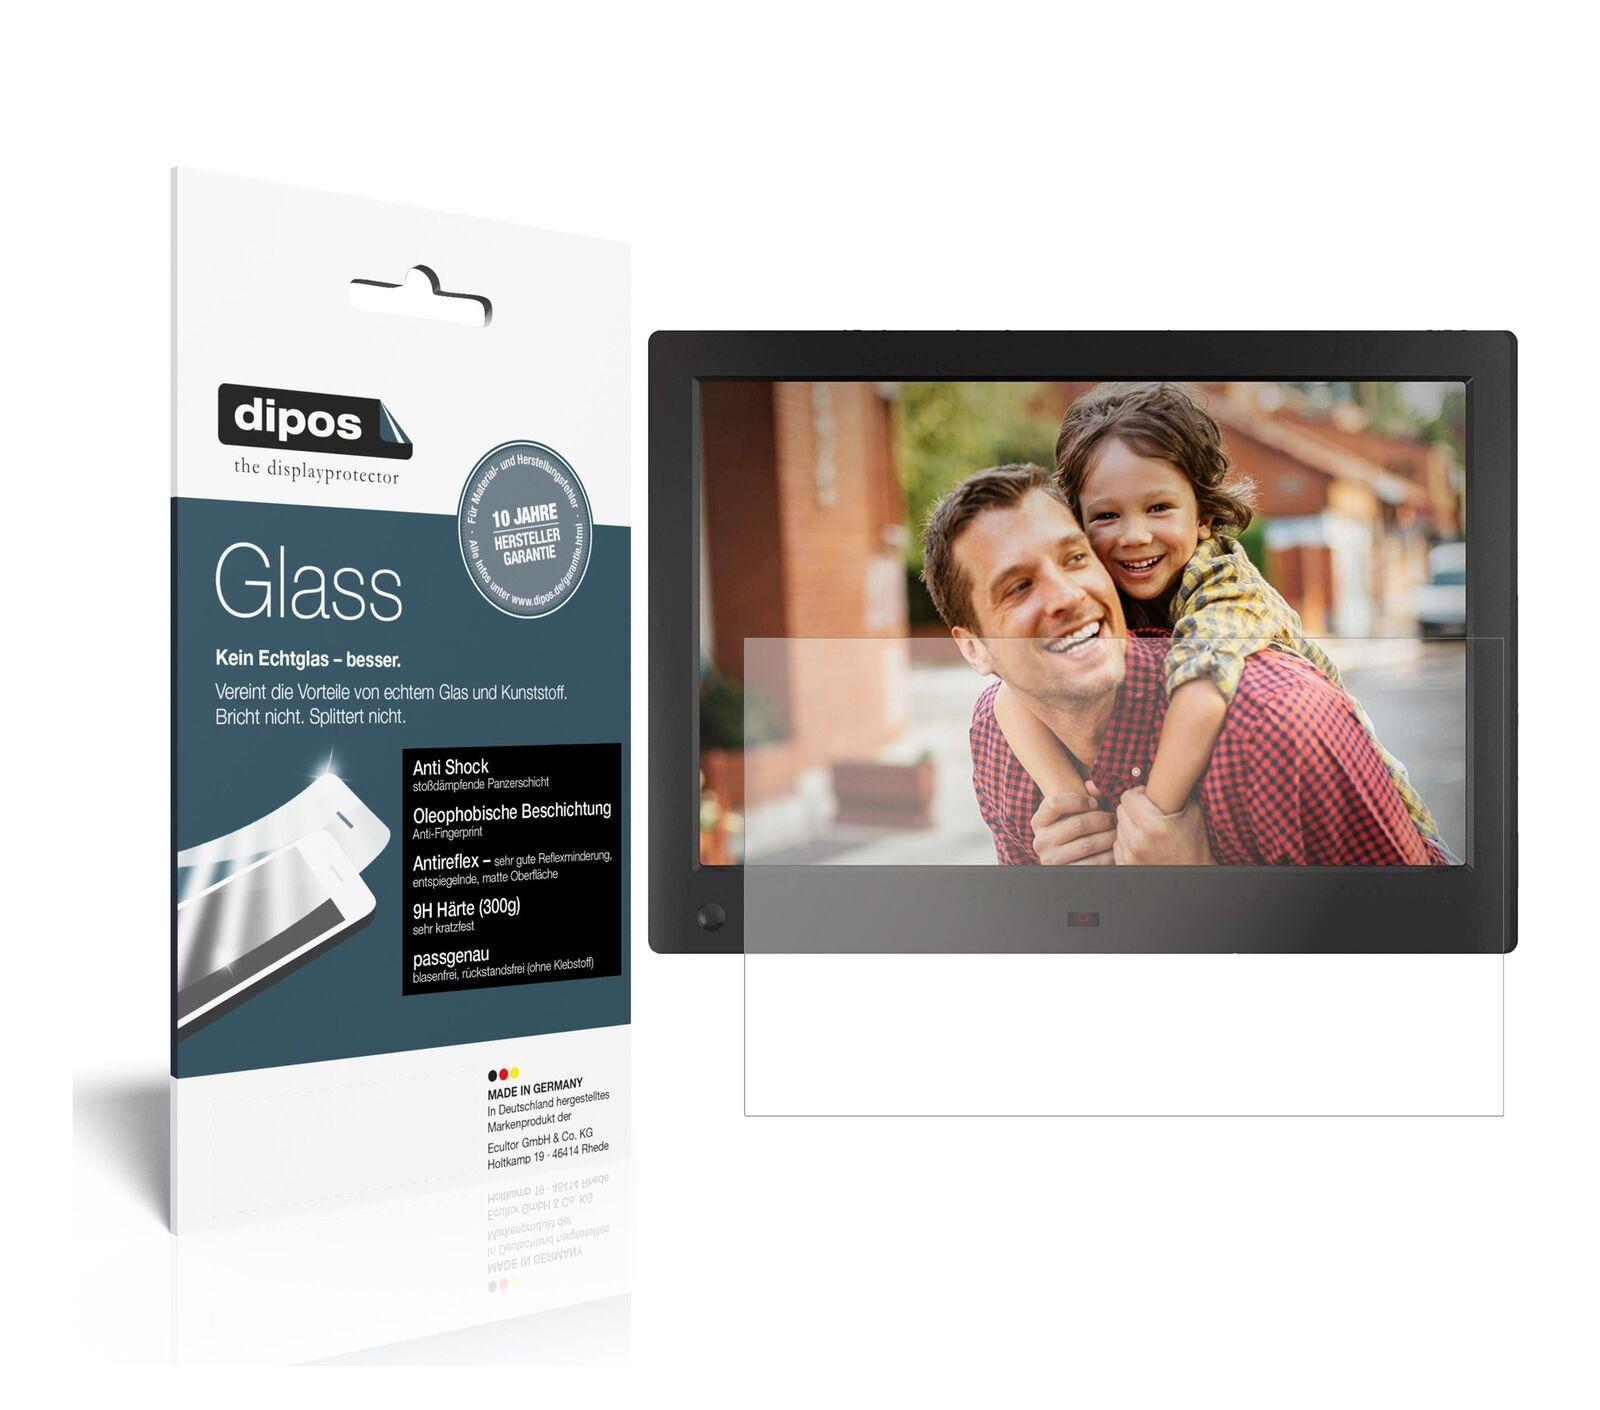 Screen Protector NIX Advance 10 inch Widescreen matte Flexible Glass 9H dipos